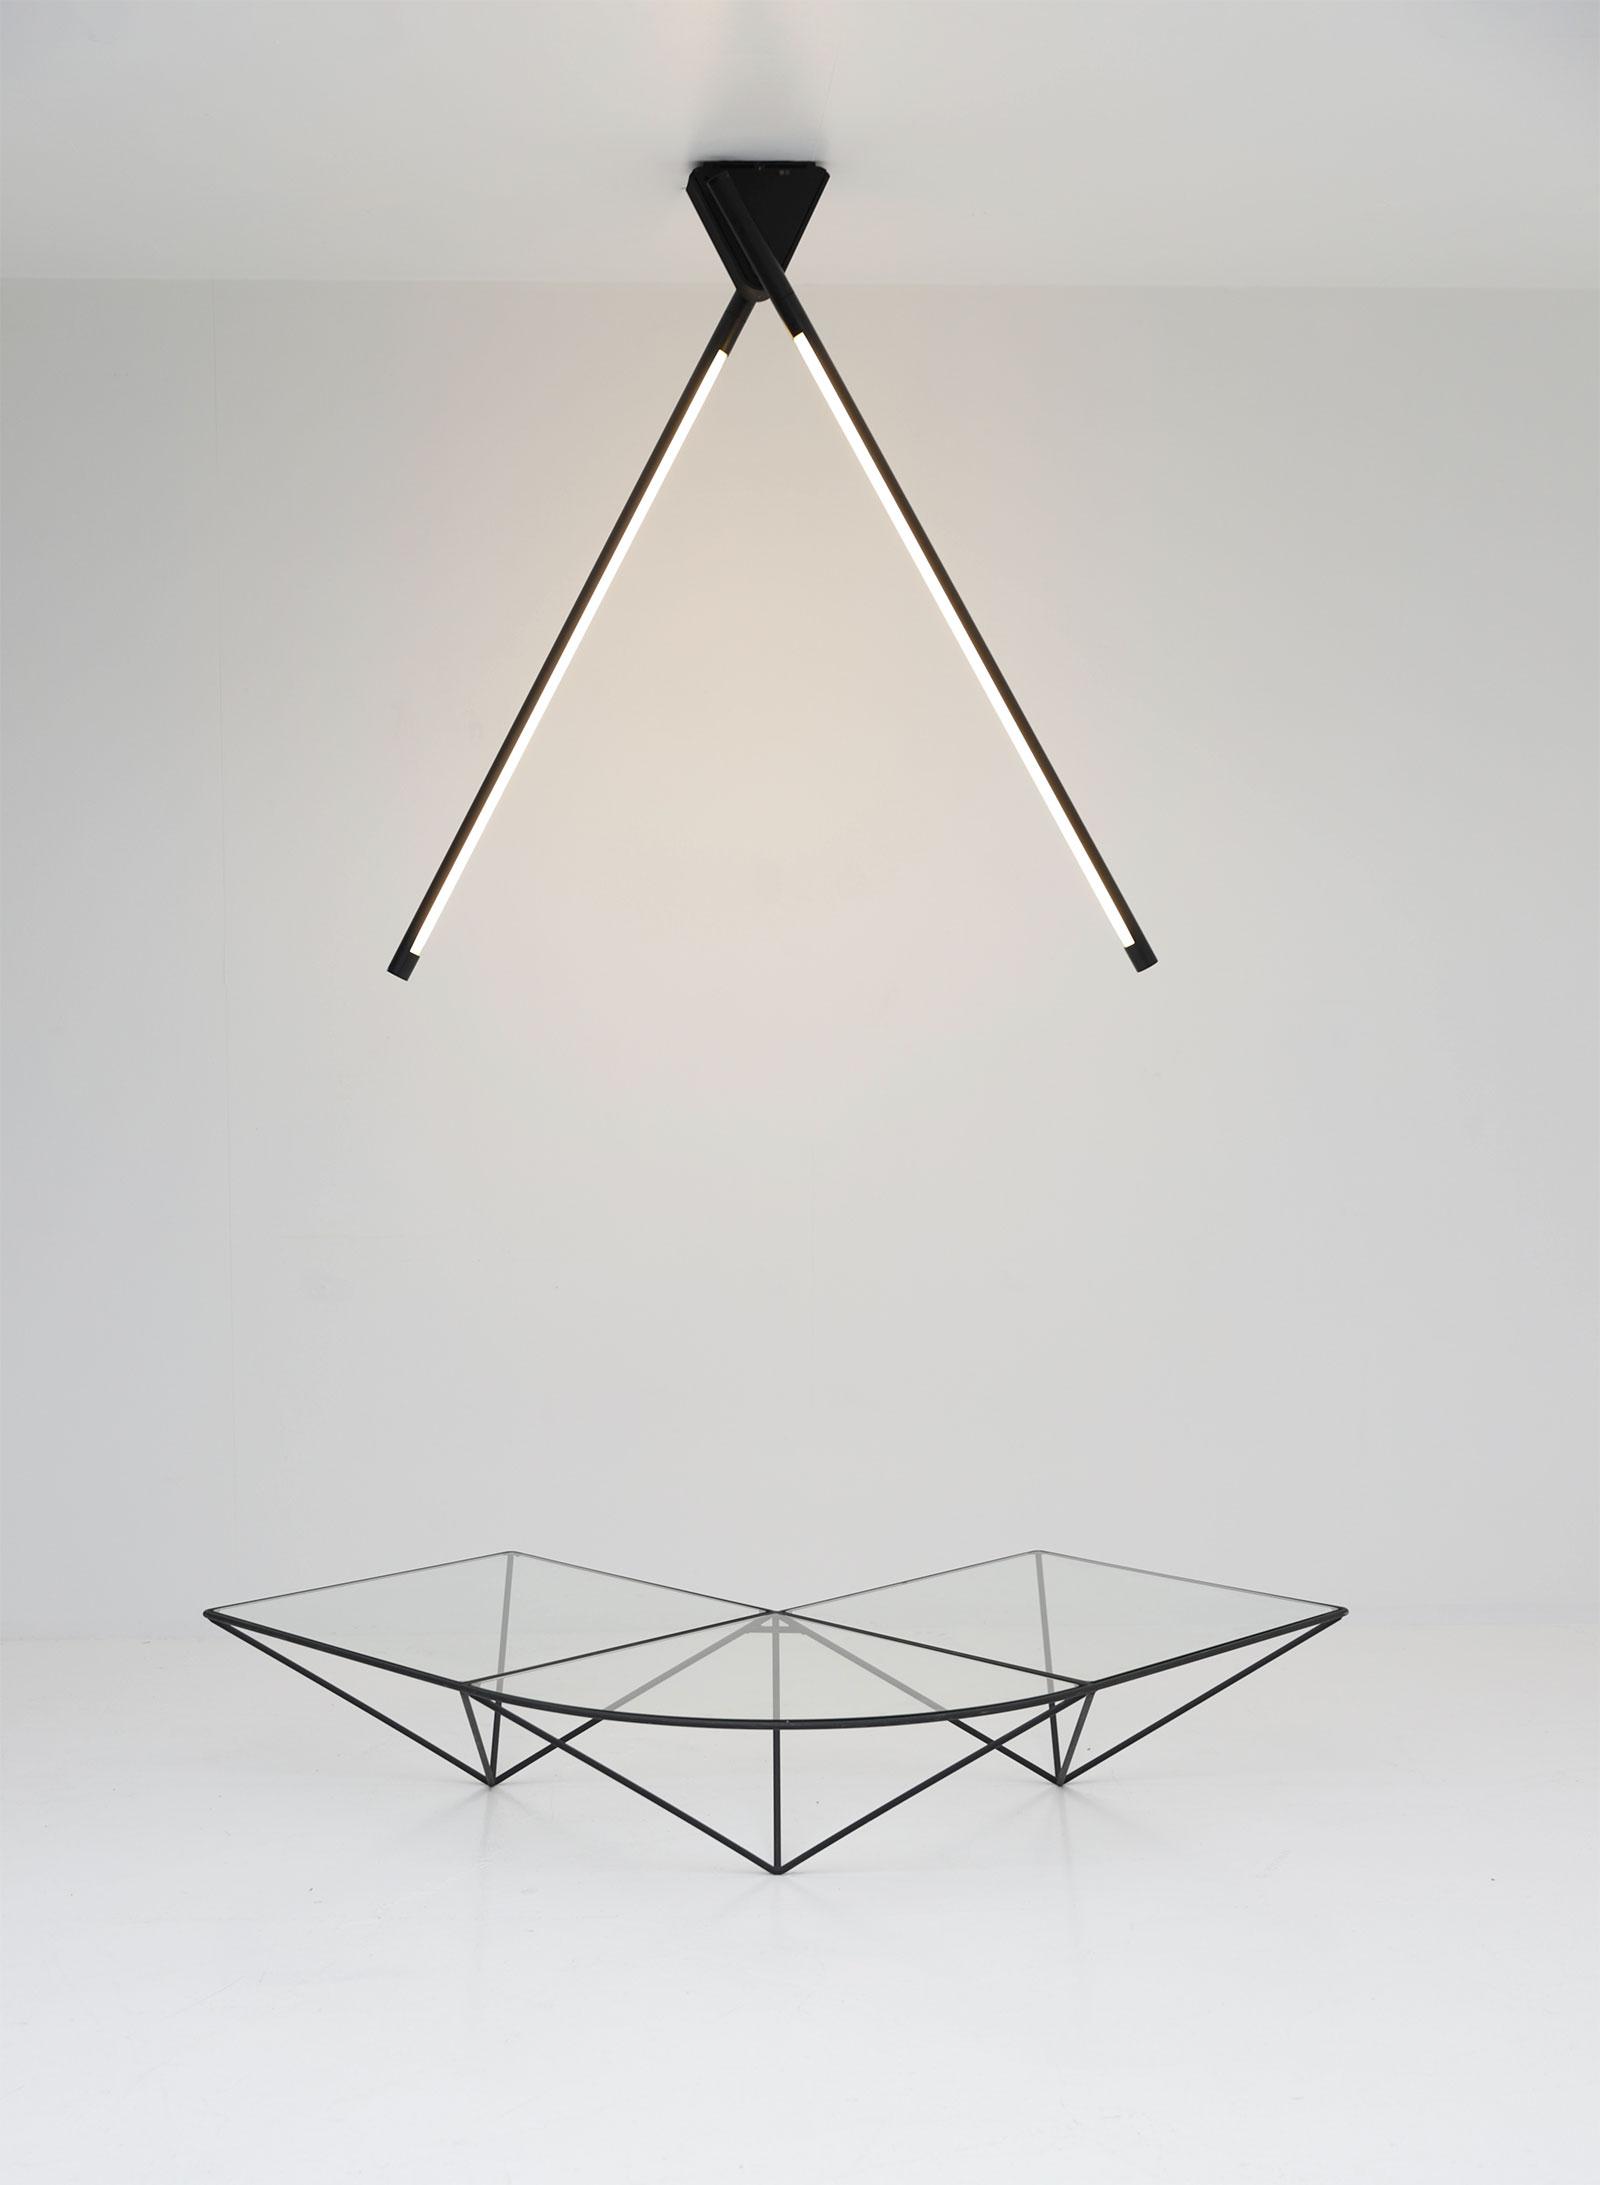 Rodolfo Bonetto Wall, Ceiling or Floor lampimage 9